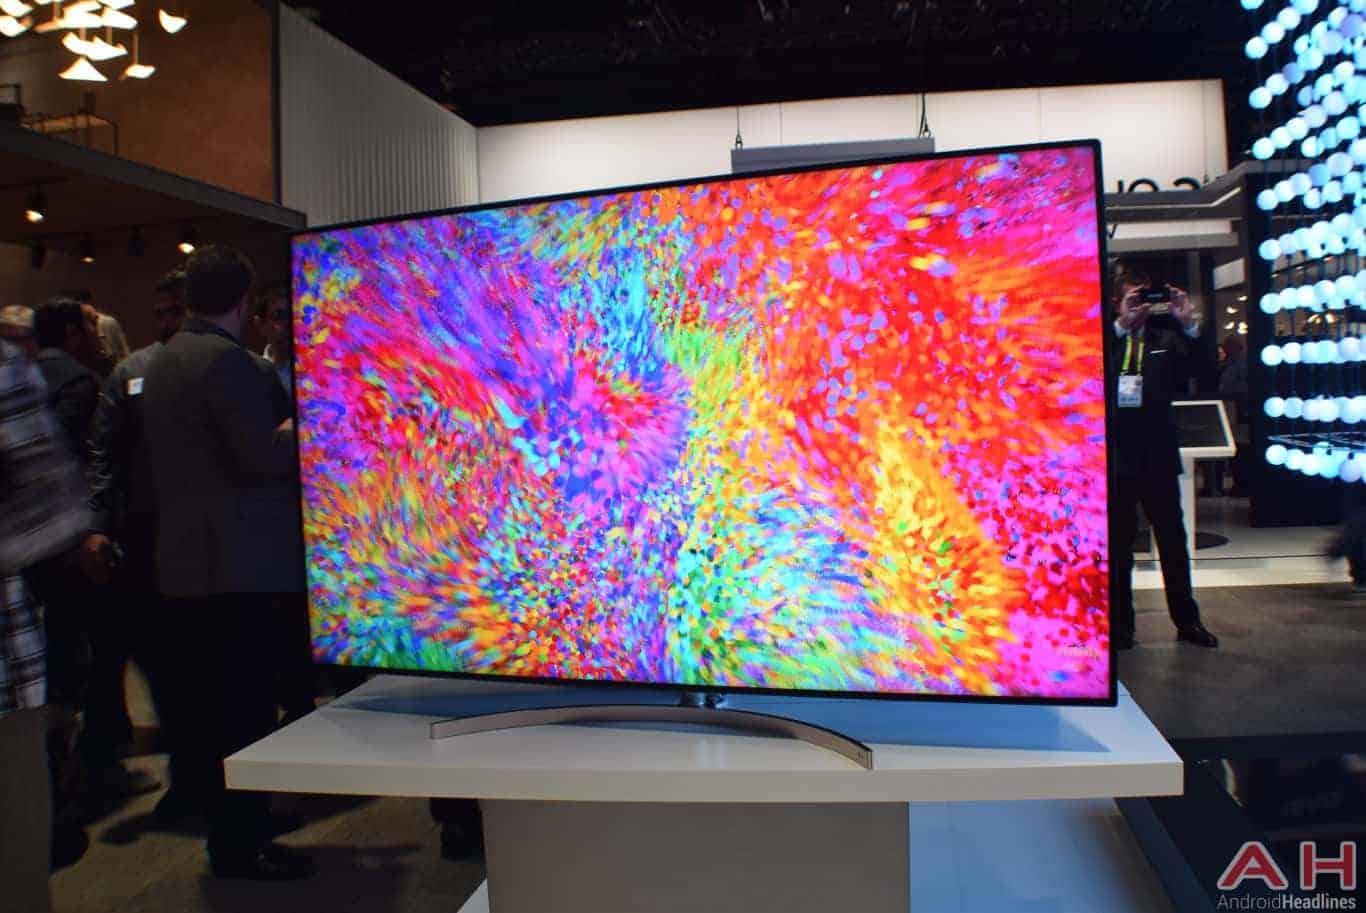 LG Nano Cell TV CES 2018 AH 1